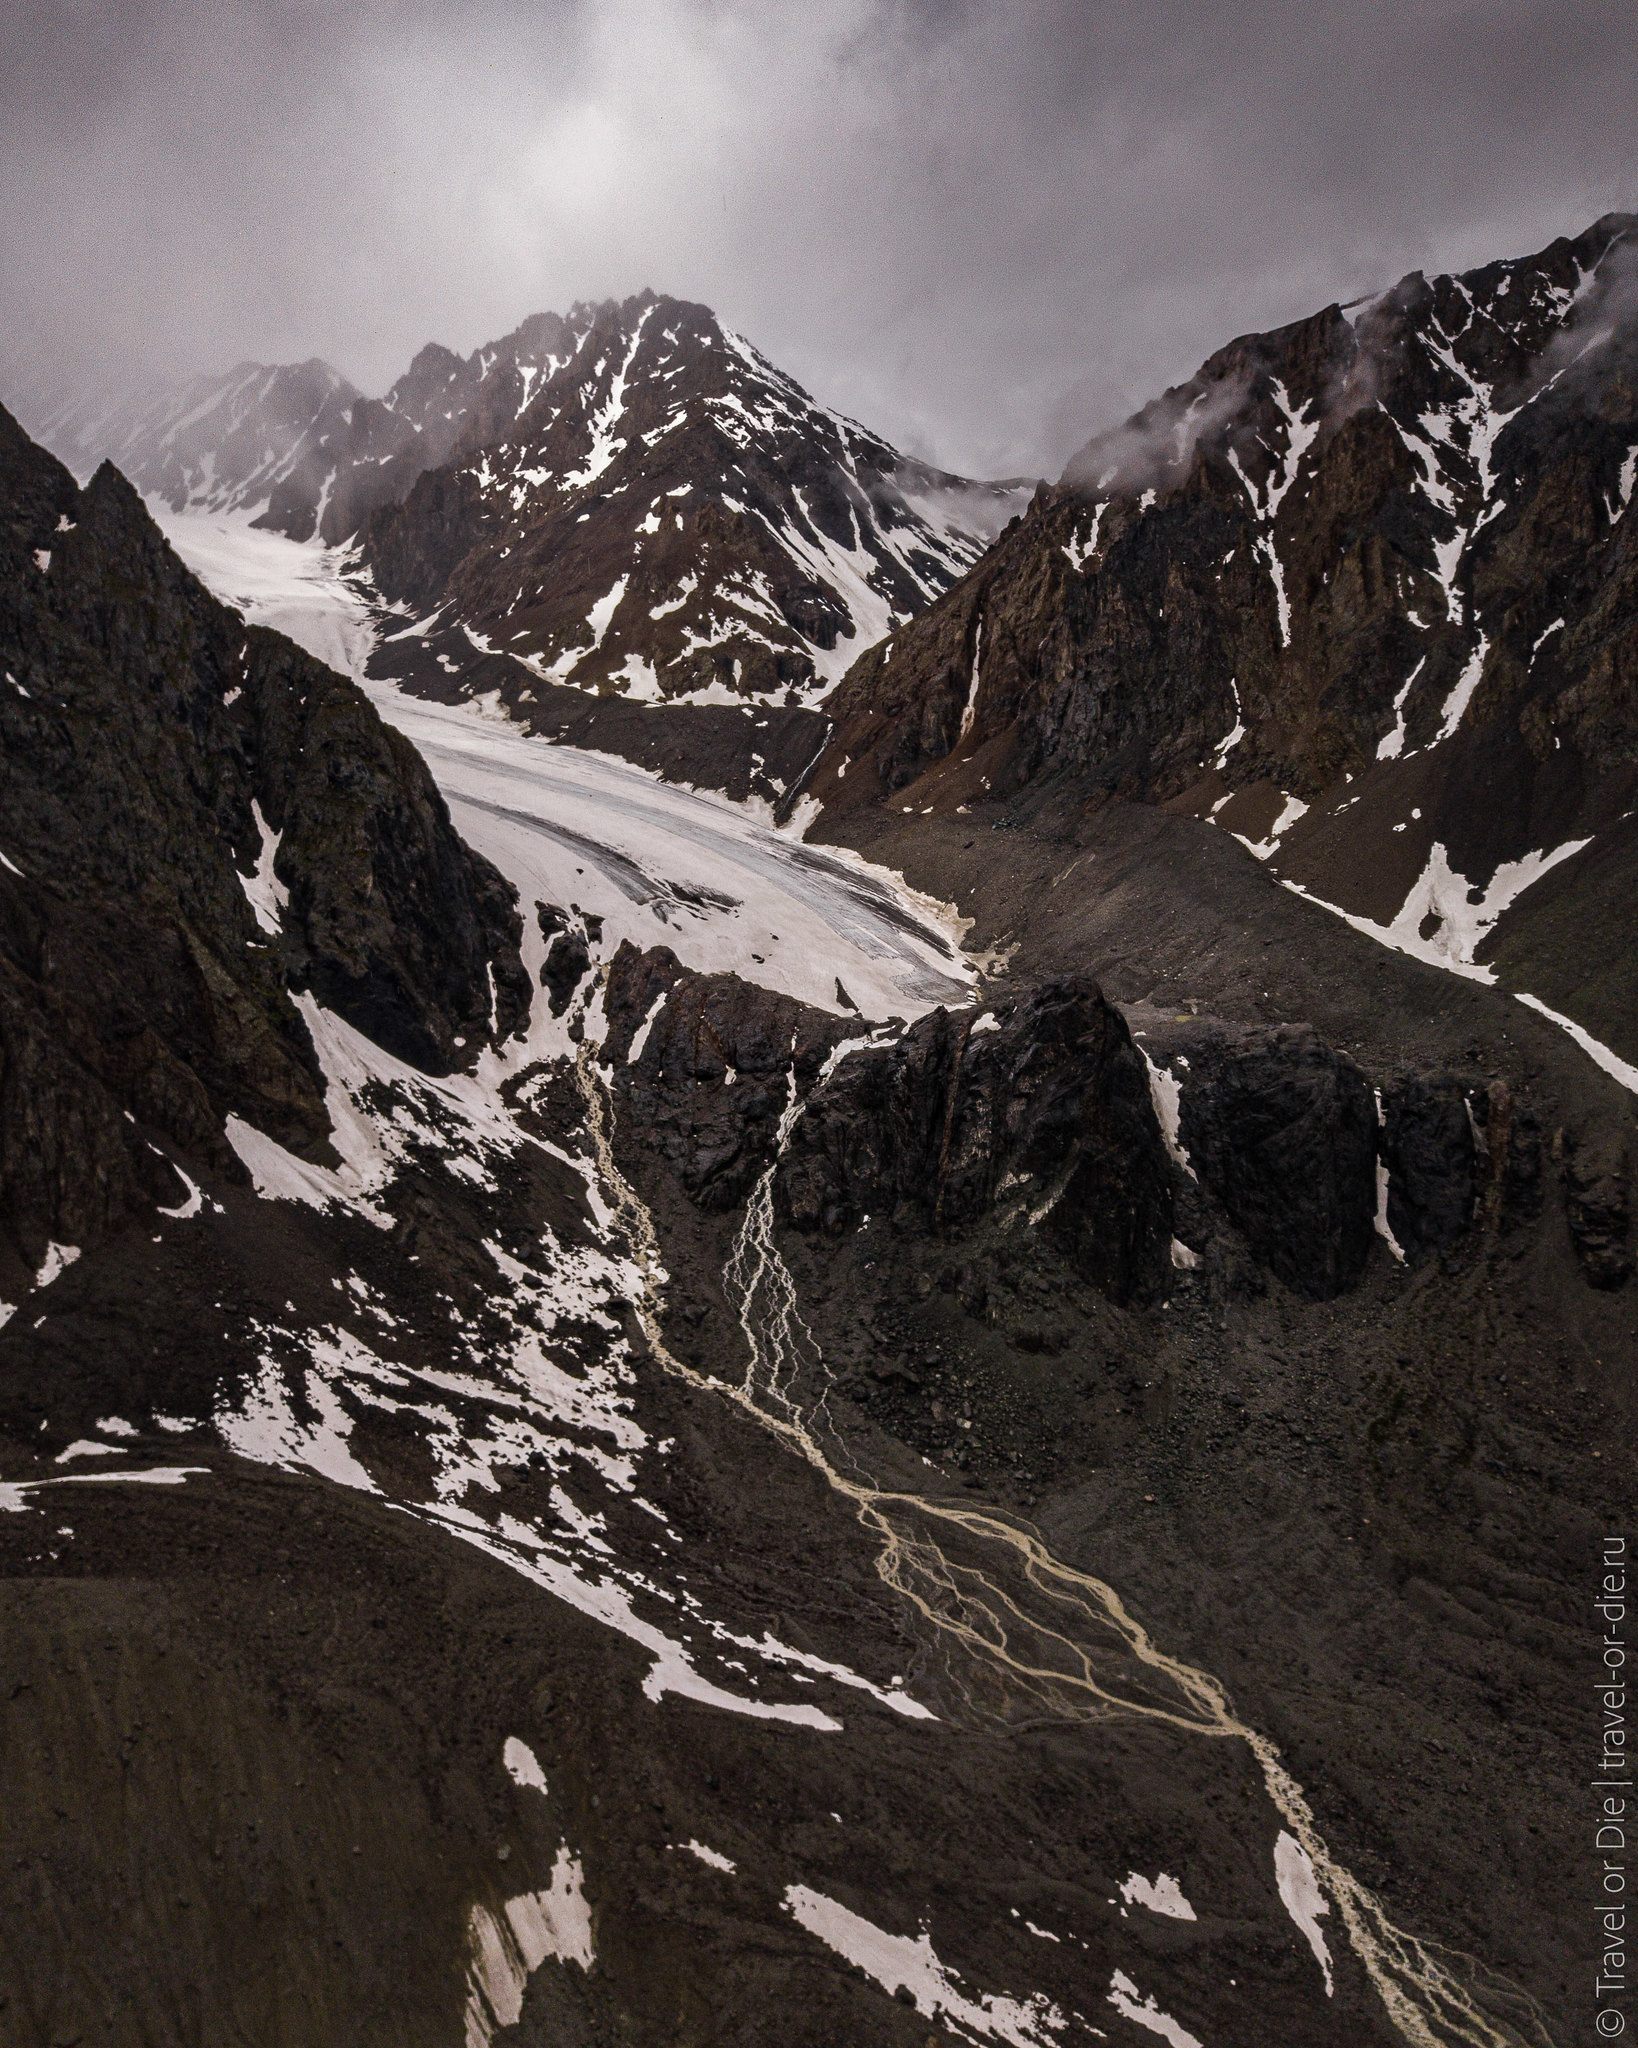 Aktru-Glacier-Altay-Ледник-Актру-Алтай-dji-mavic-0532